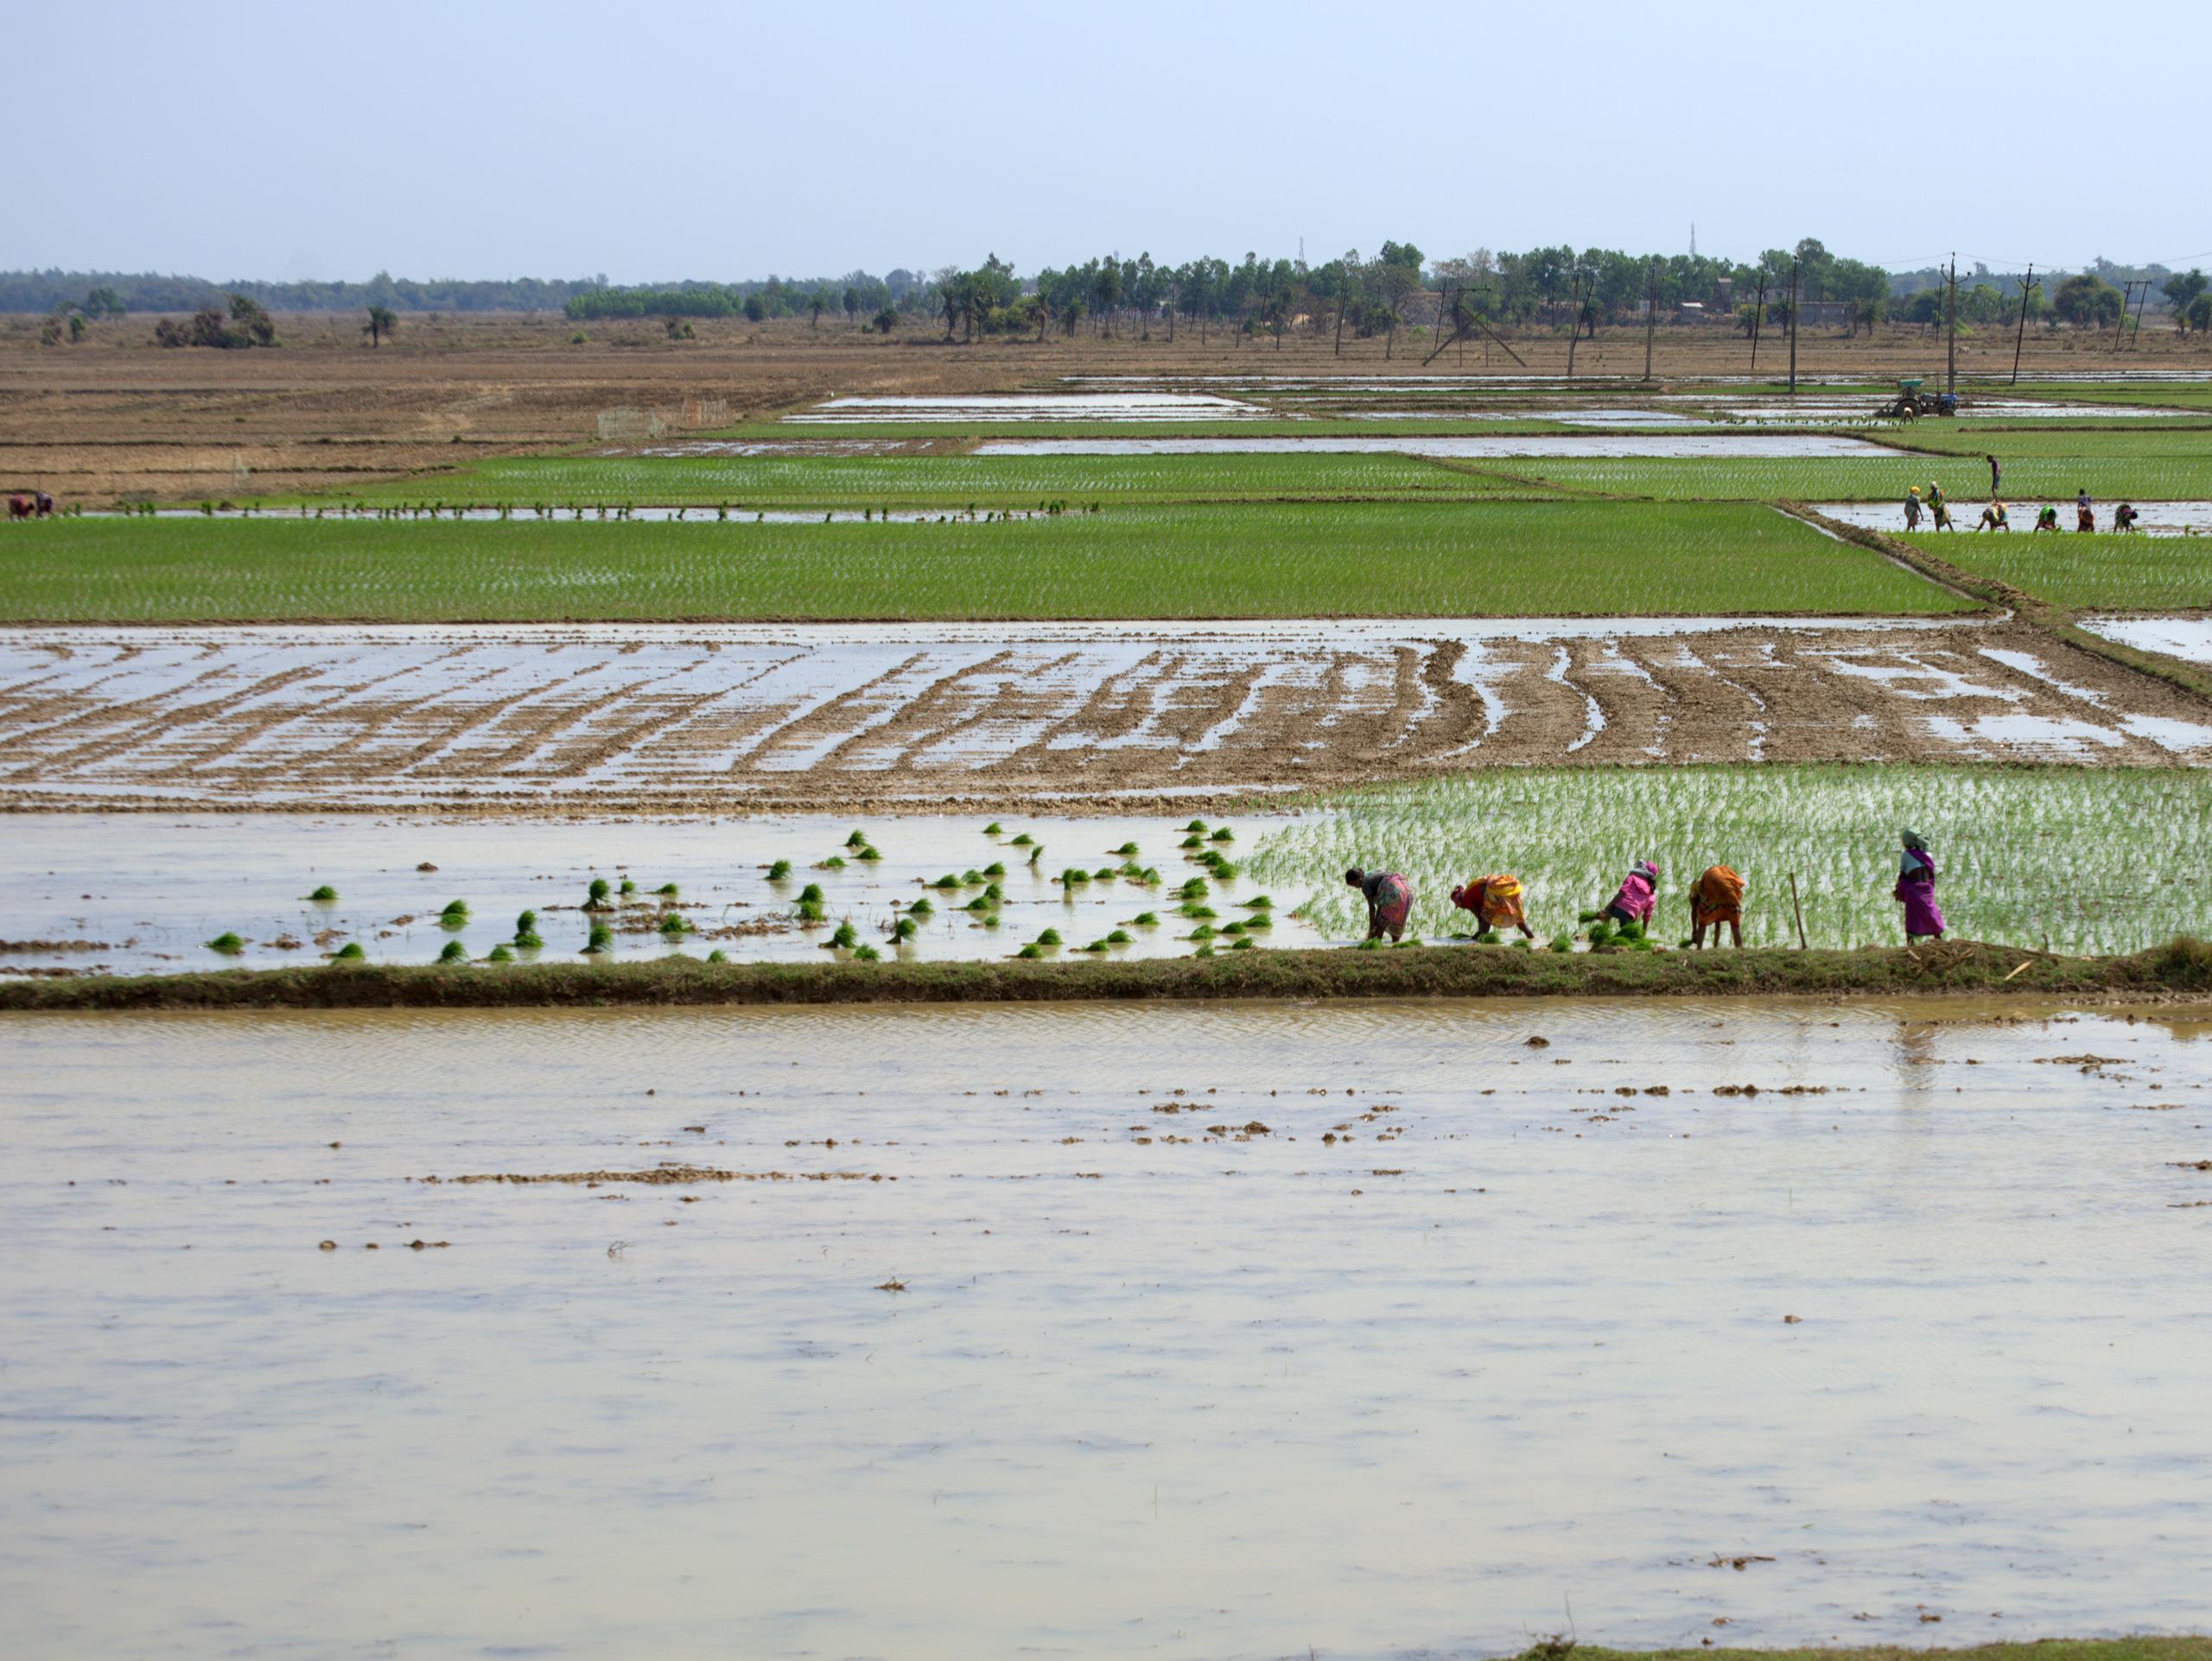 Farmers work on rice paddies. (Photo: Dakshinamurthy Vedachalam/CIMMYT)